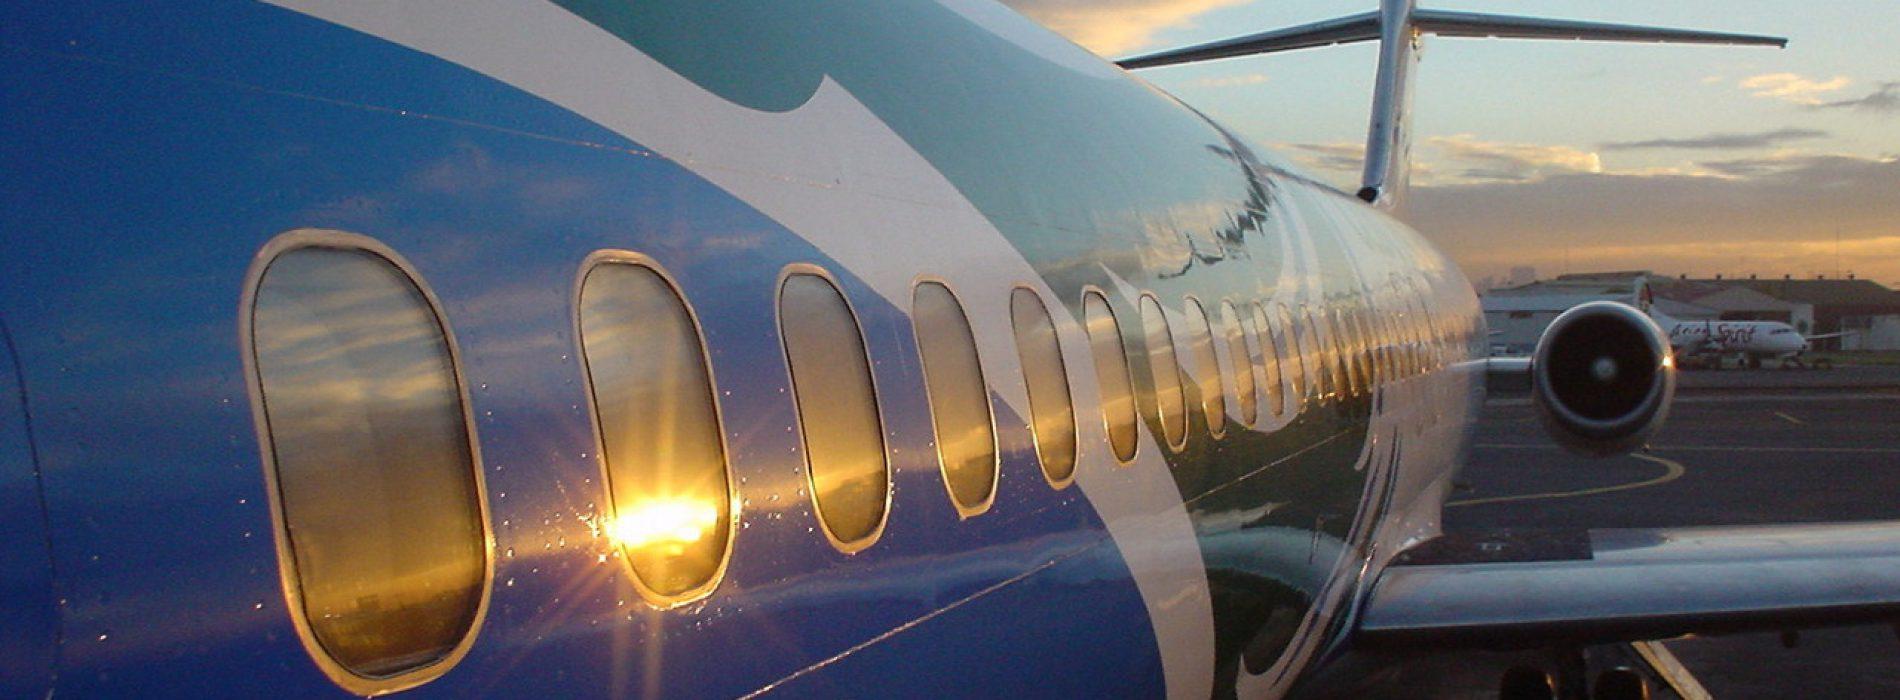 Katastrofa samolotu pasażerskiego nad Egiptem